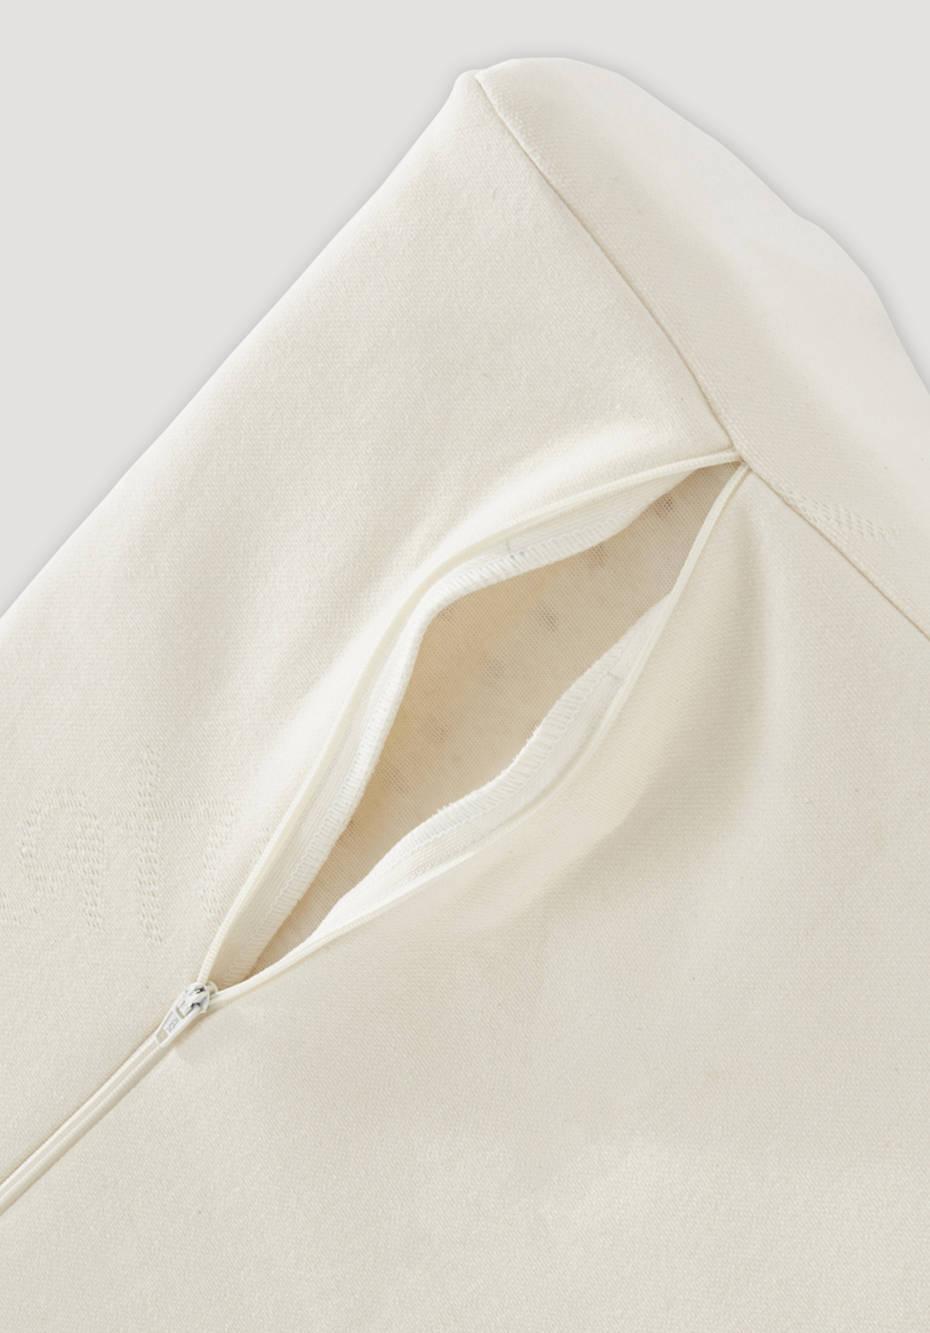 Neck support pillow ERGONOMIC